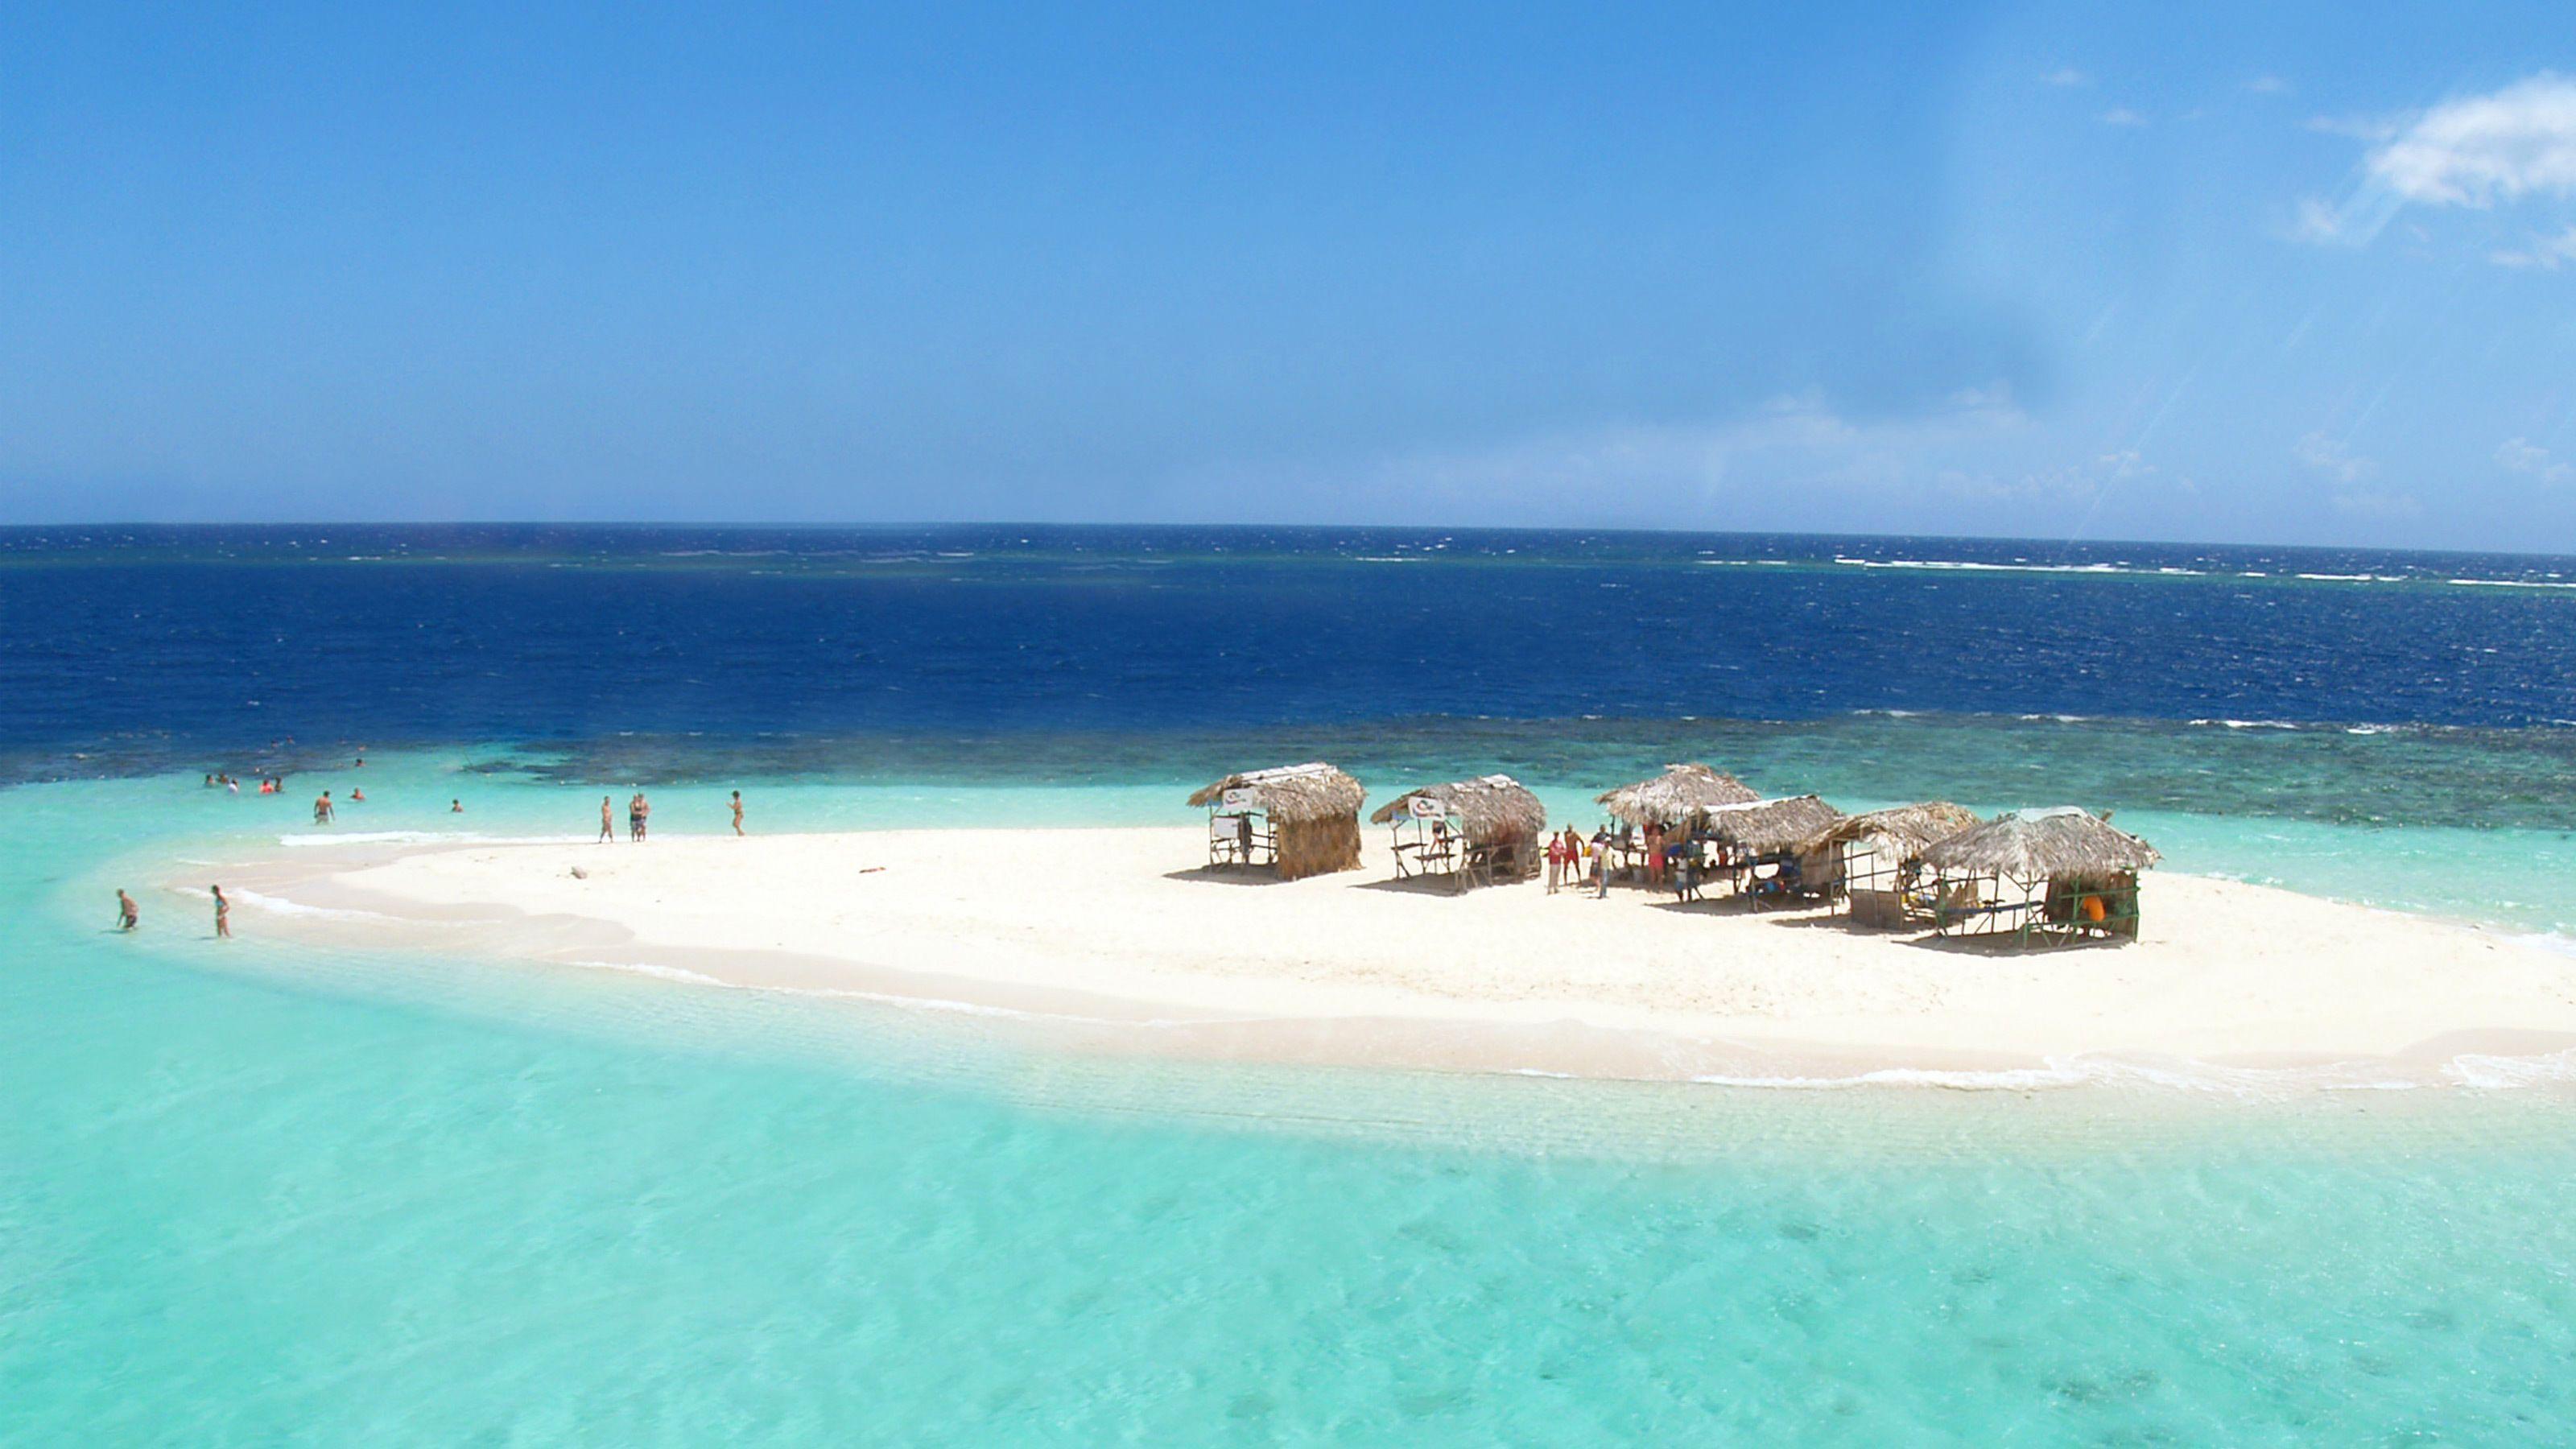 Paradise Island Snorkeling & Beach Day